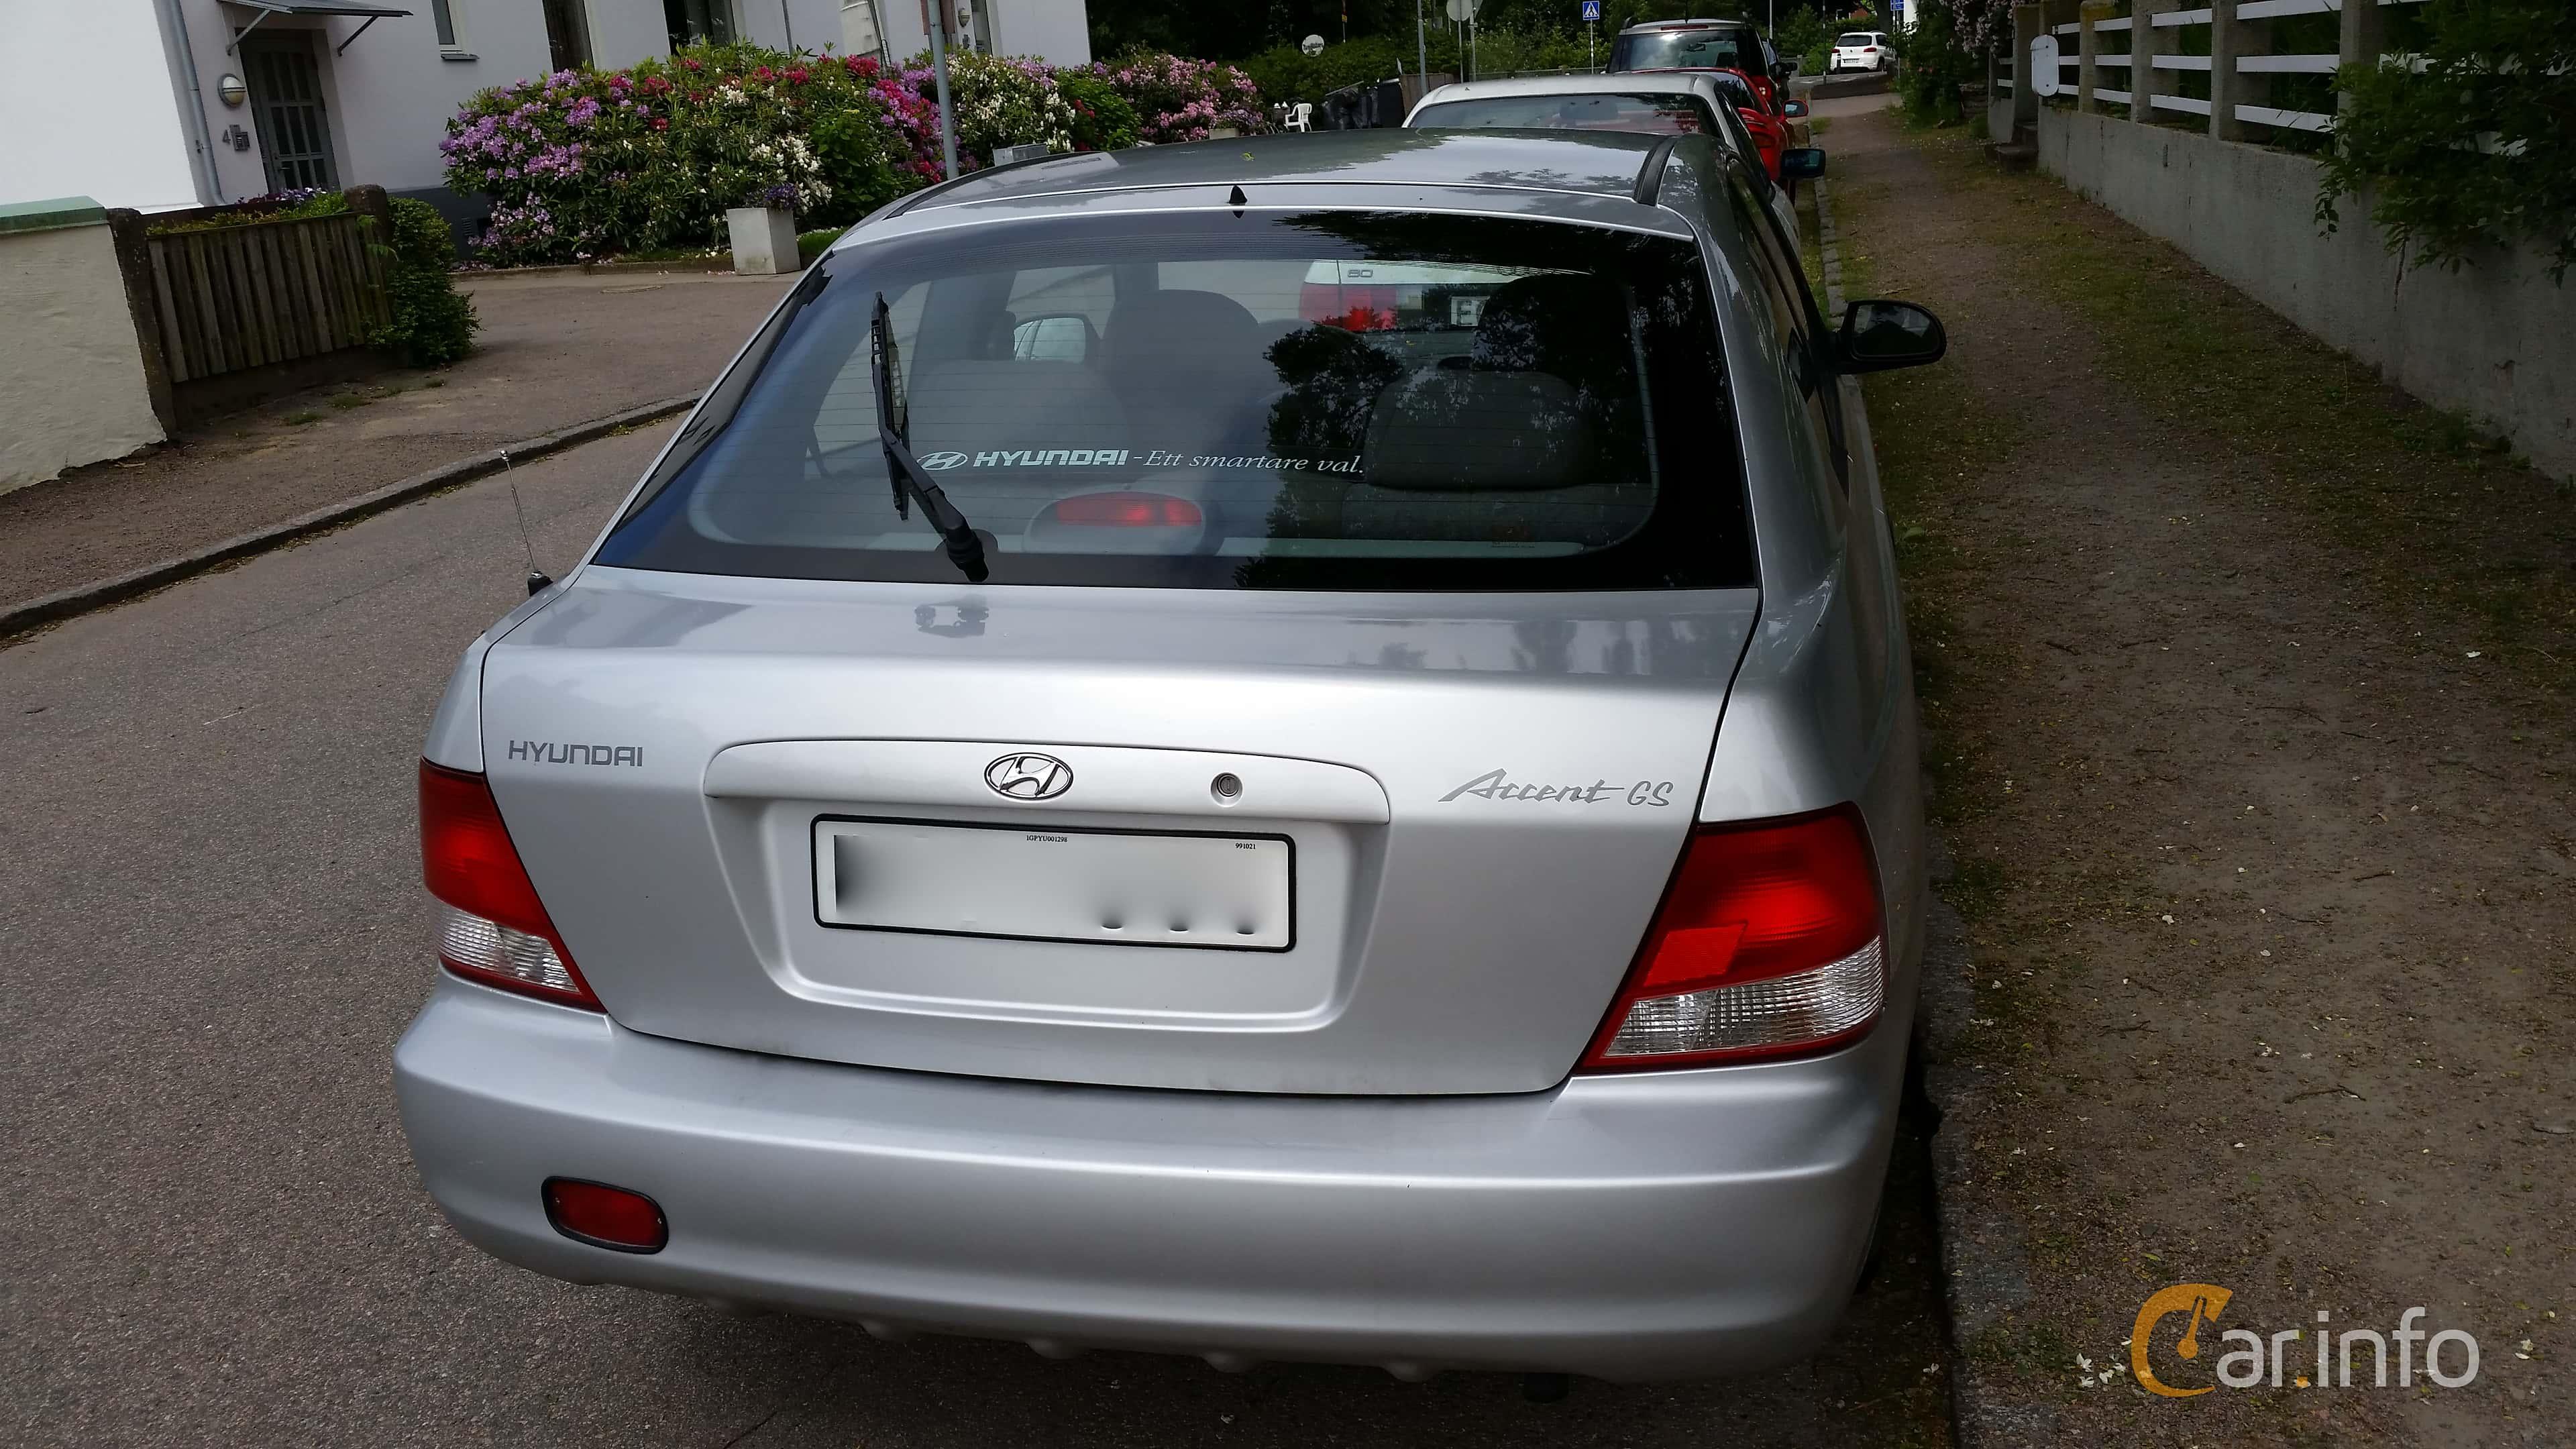 Hyundai Accent 3-door 1.5 Manual, 90hp, 2000